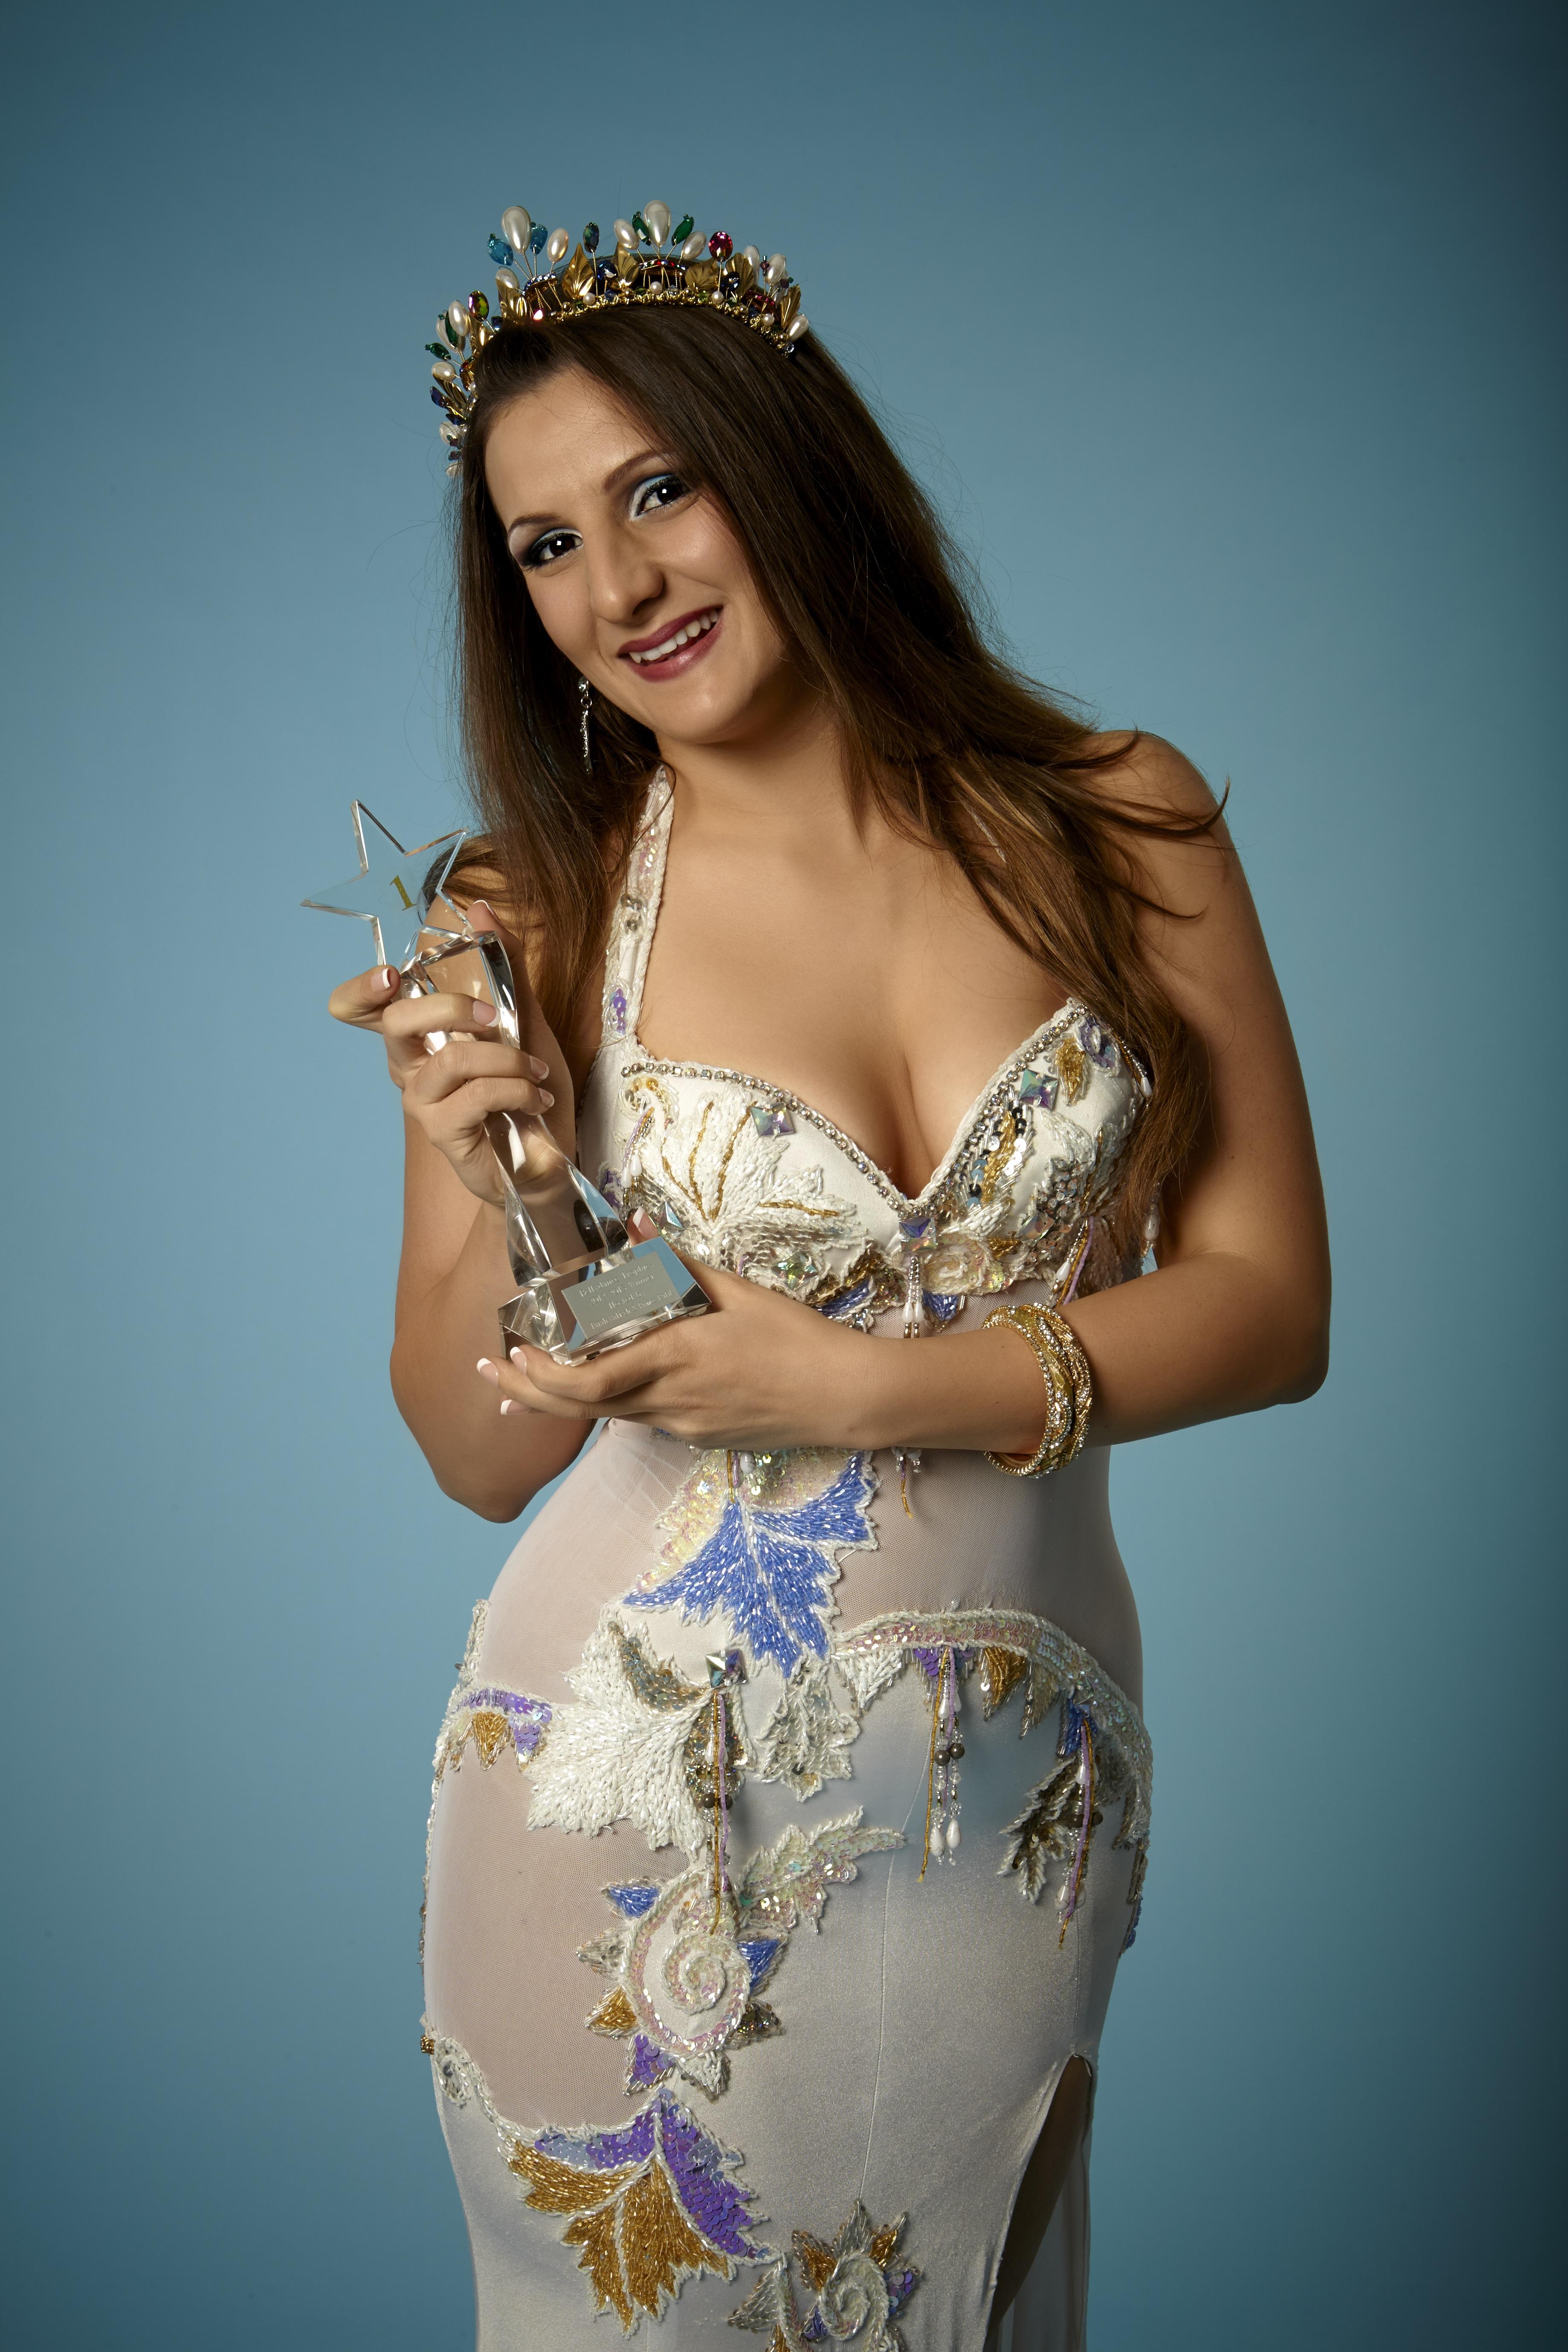 Zara Dance Egyptian bellydancer